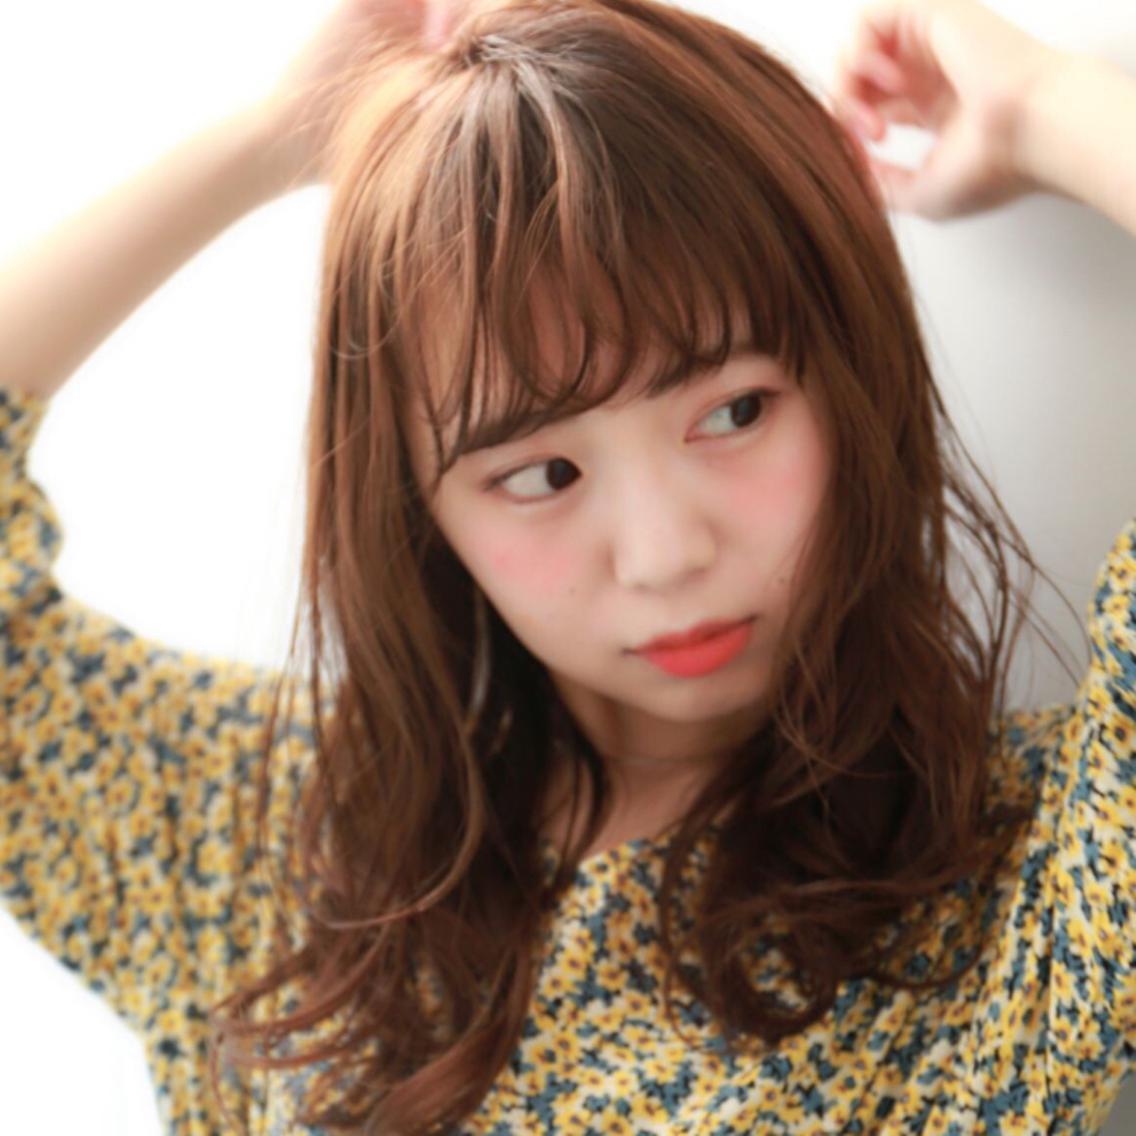 ❤️当日すぐ予約ok!❤️横浜駅徒歩5分❤︎外国人風透明感カラー❤︎¥5000〜大人気Aujua取り扱い店